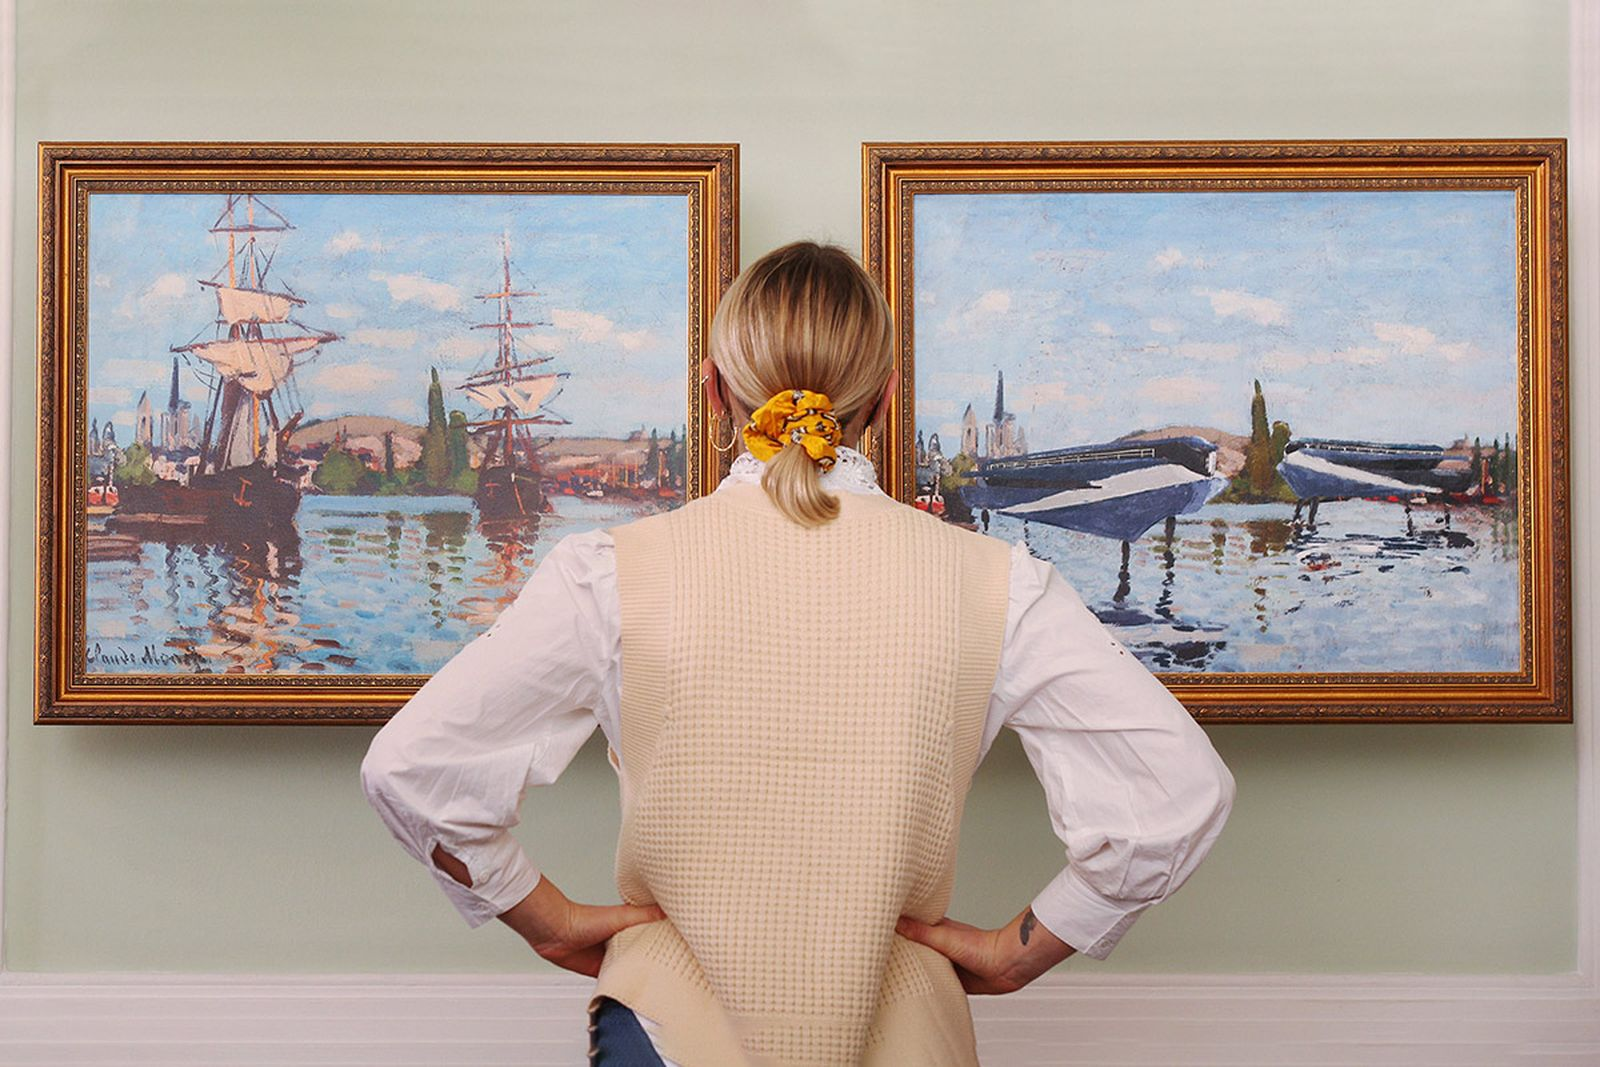 reuben-dangoor-taps-the-great-masters-to-imagine-future-seascapes-main